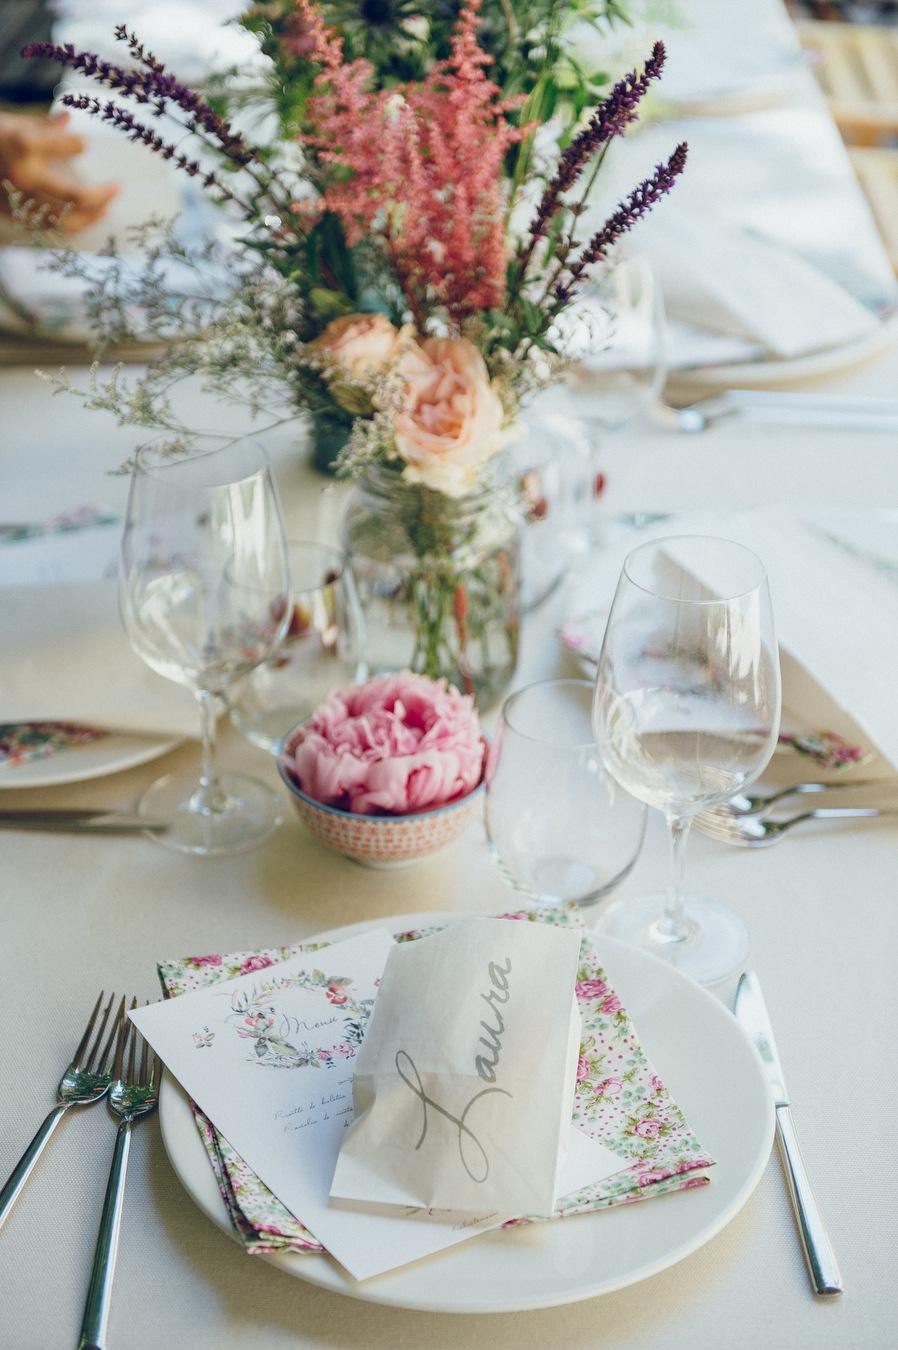 calista-one-lista-de-bodas-online-blog-de-bodas-calista-one-summer-party-2016-wedding-planner-dpleis-3